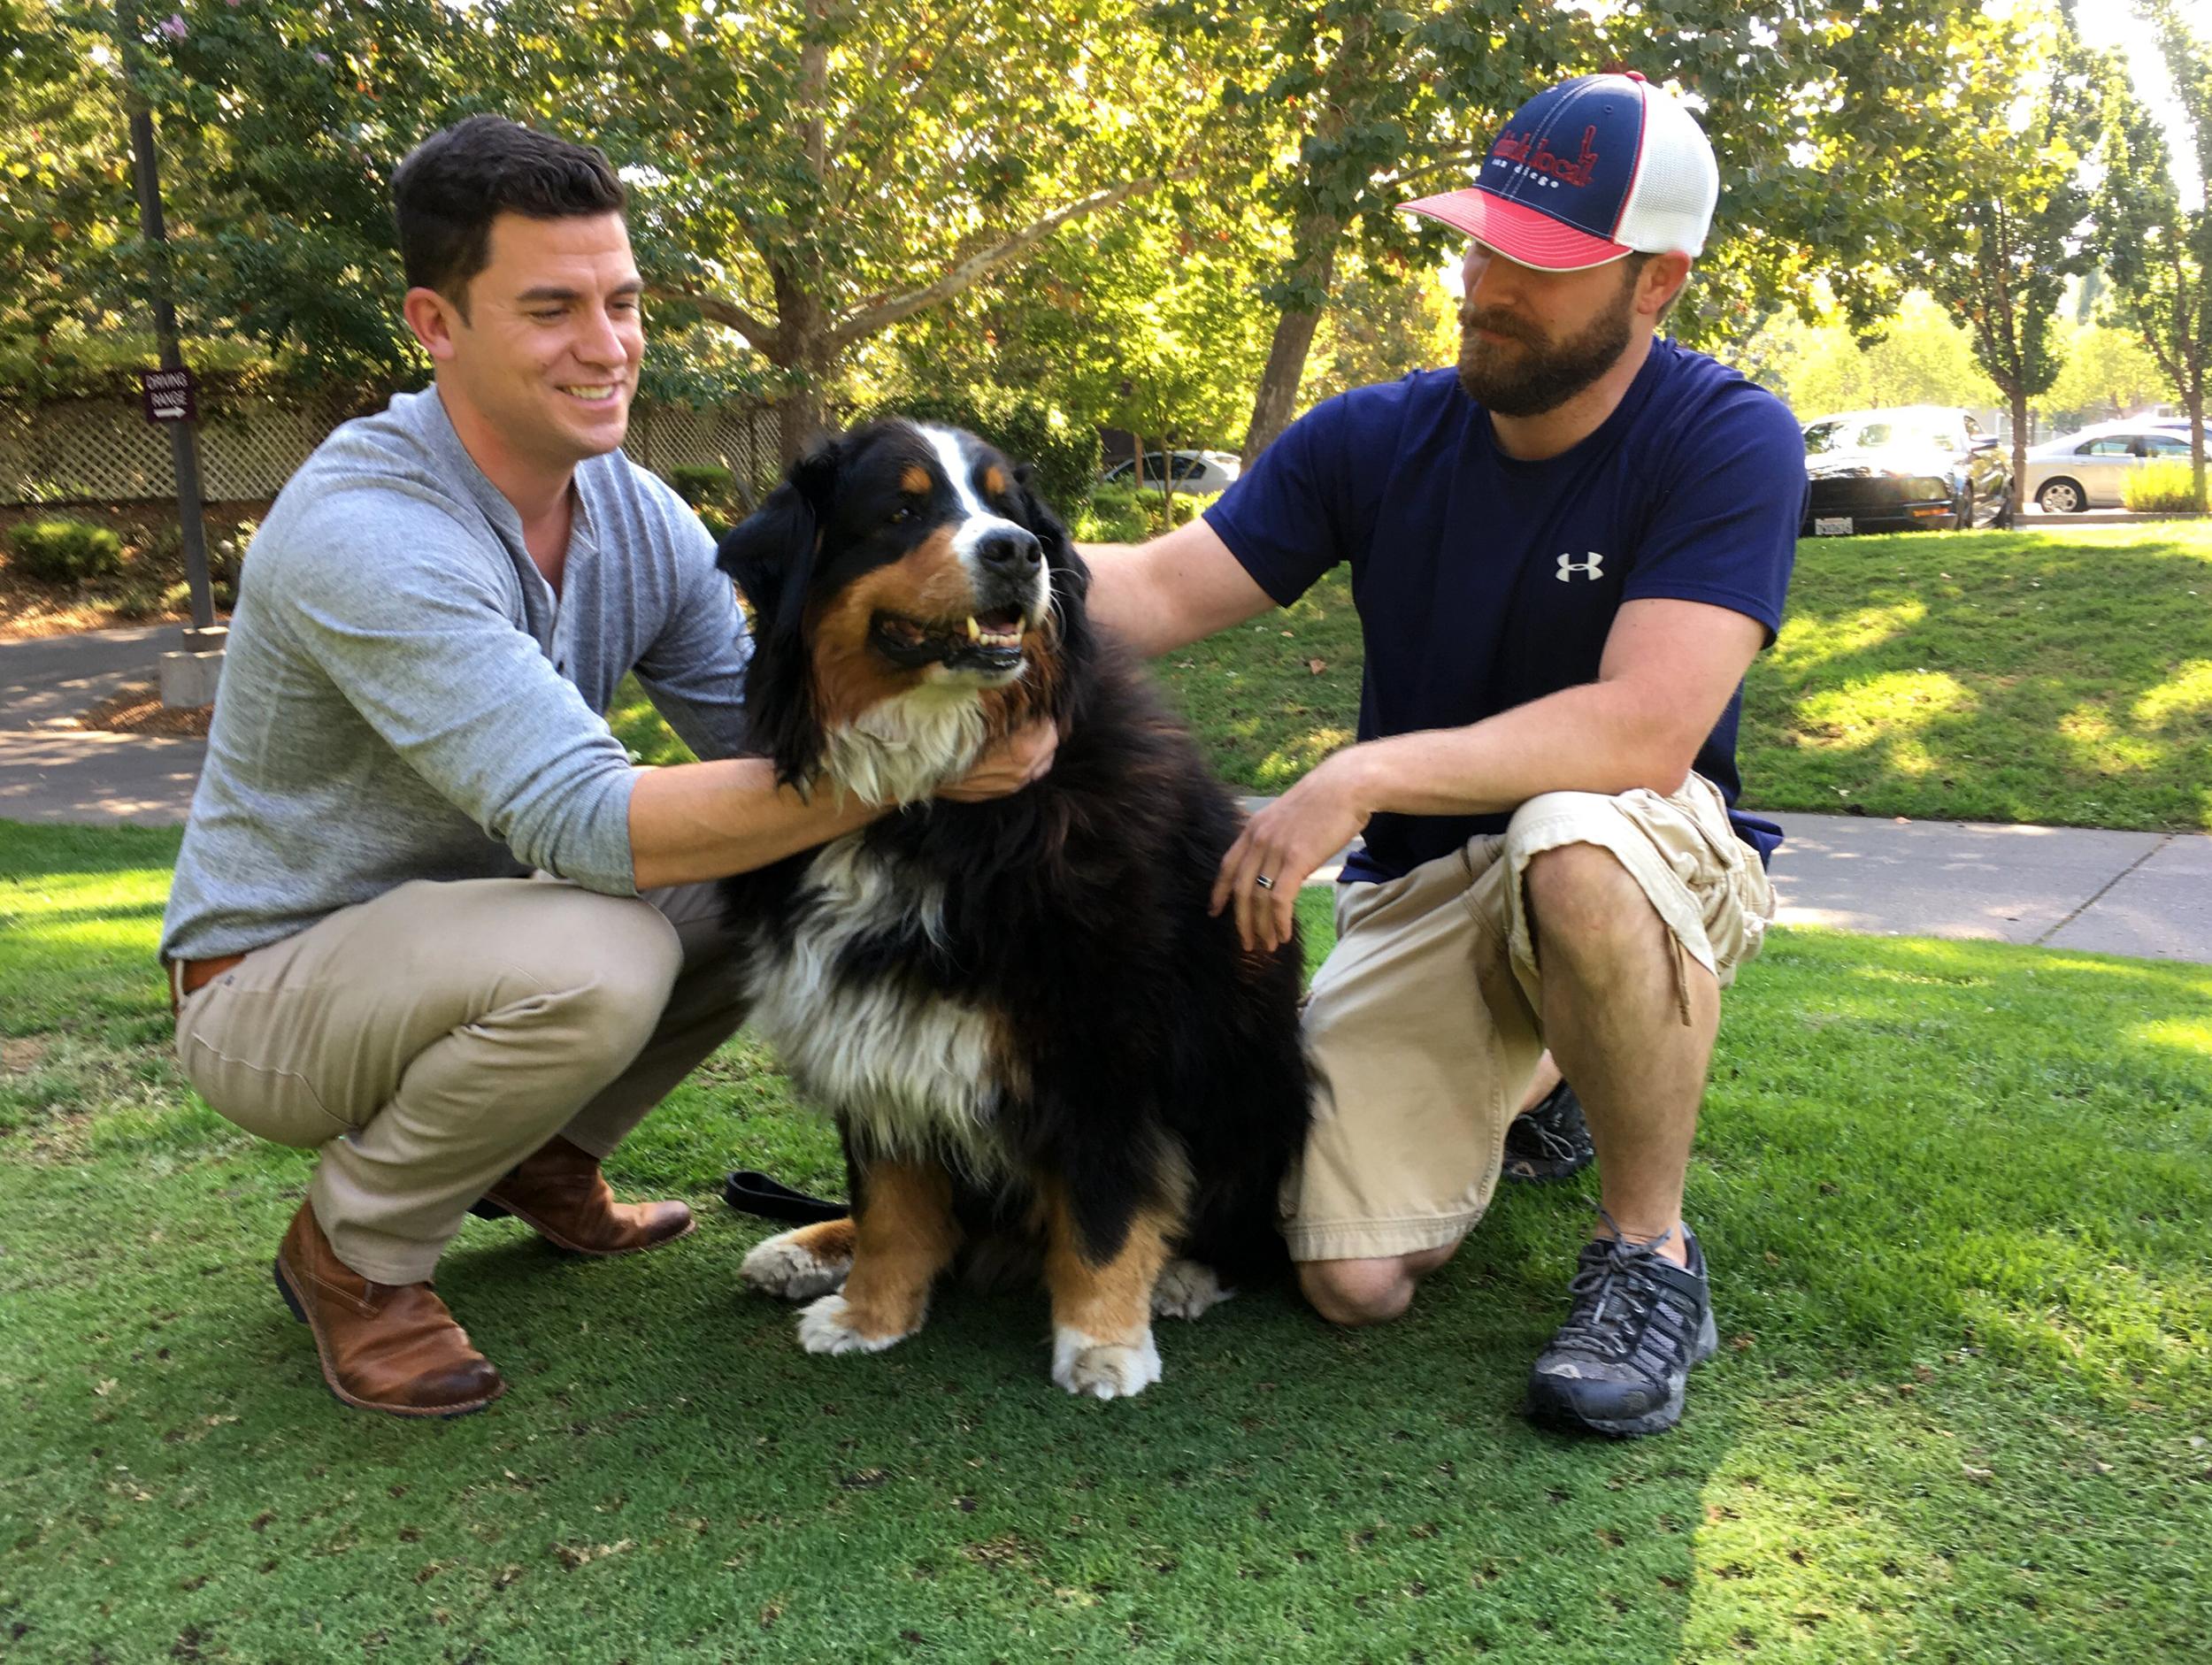 Family Finds Beloved Dog Alive After Believed Lost To